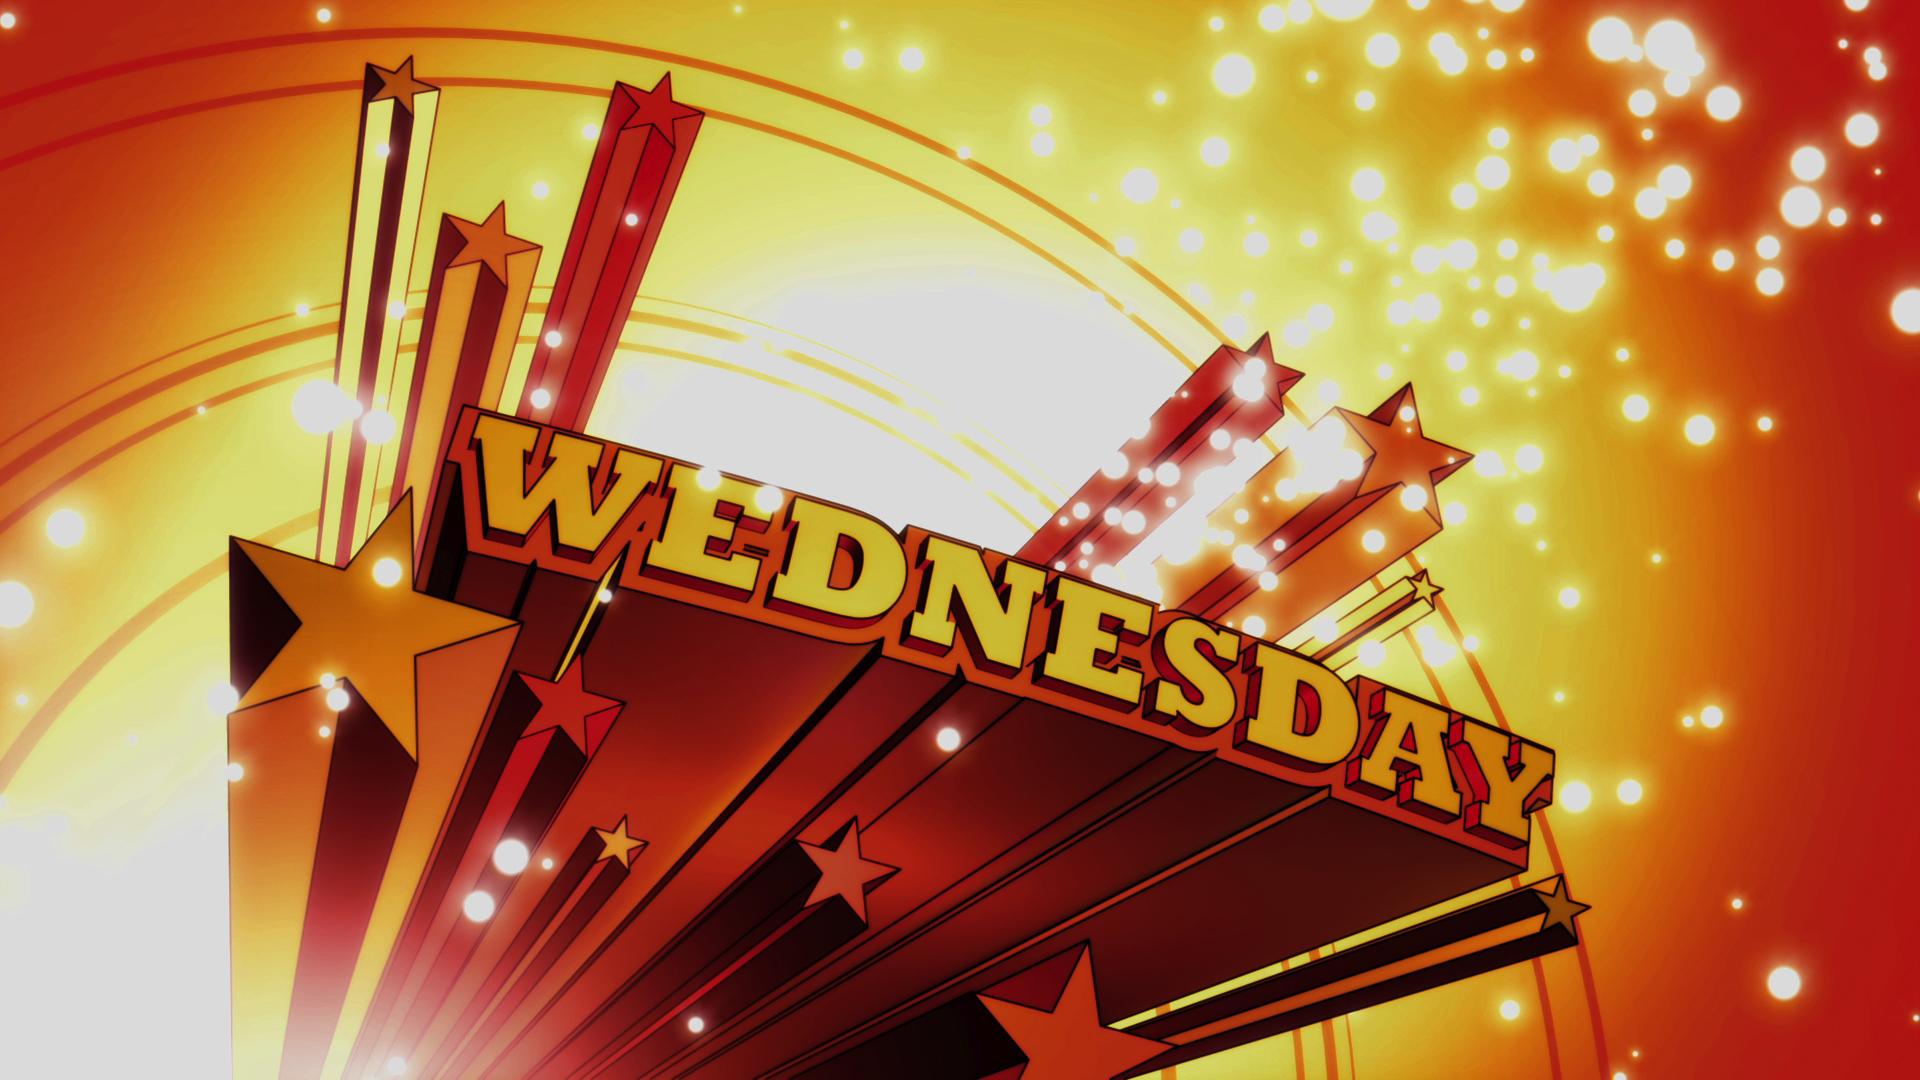 Wednesday_ID_15_01_CC.jpg